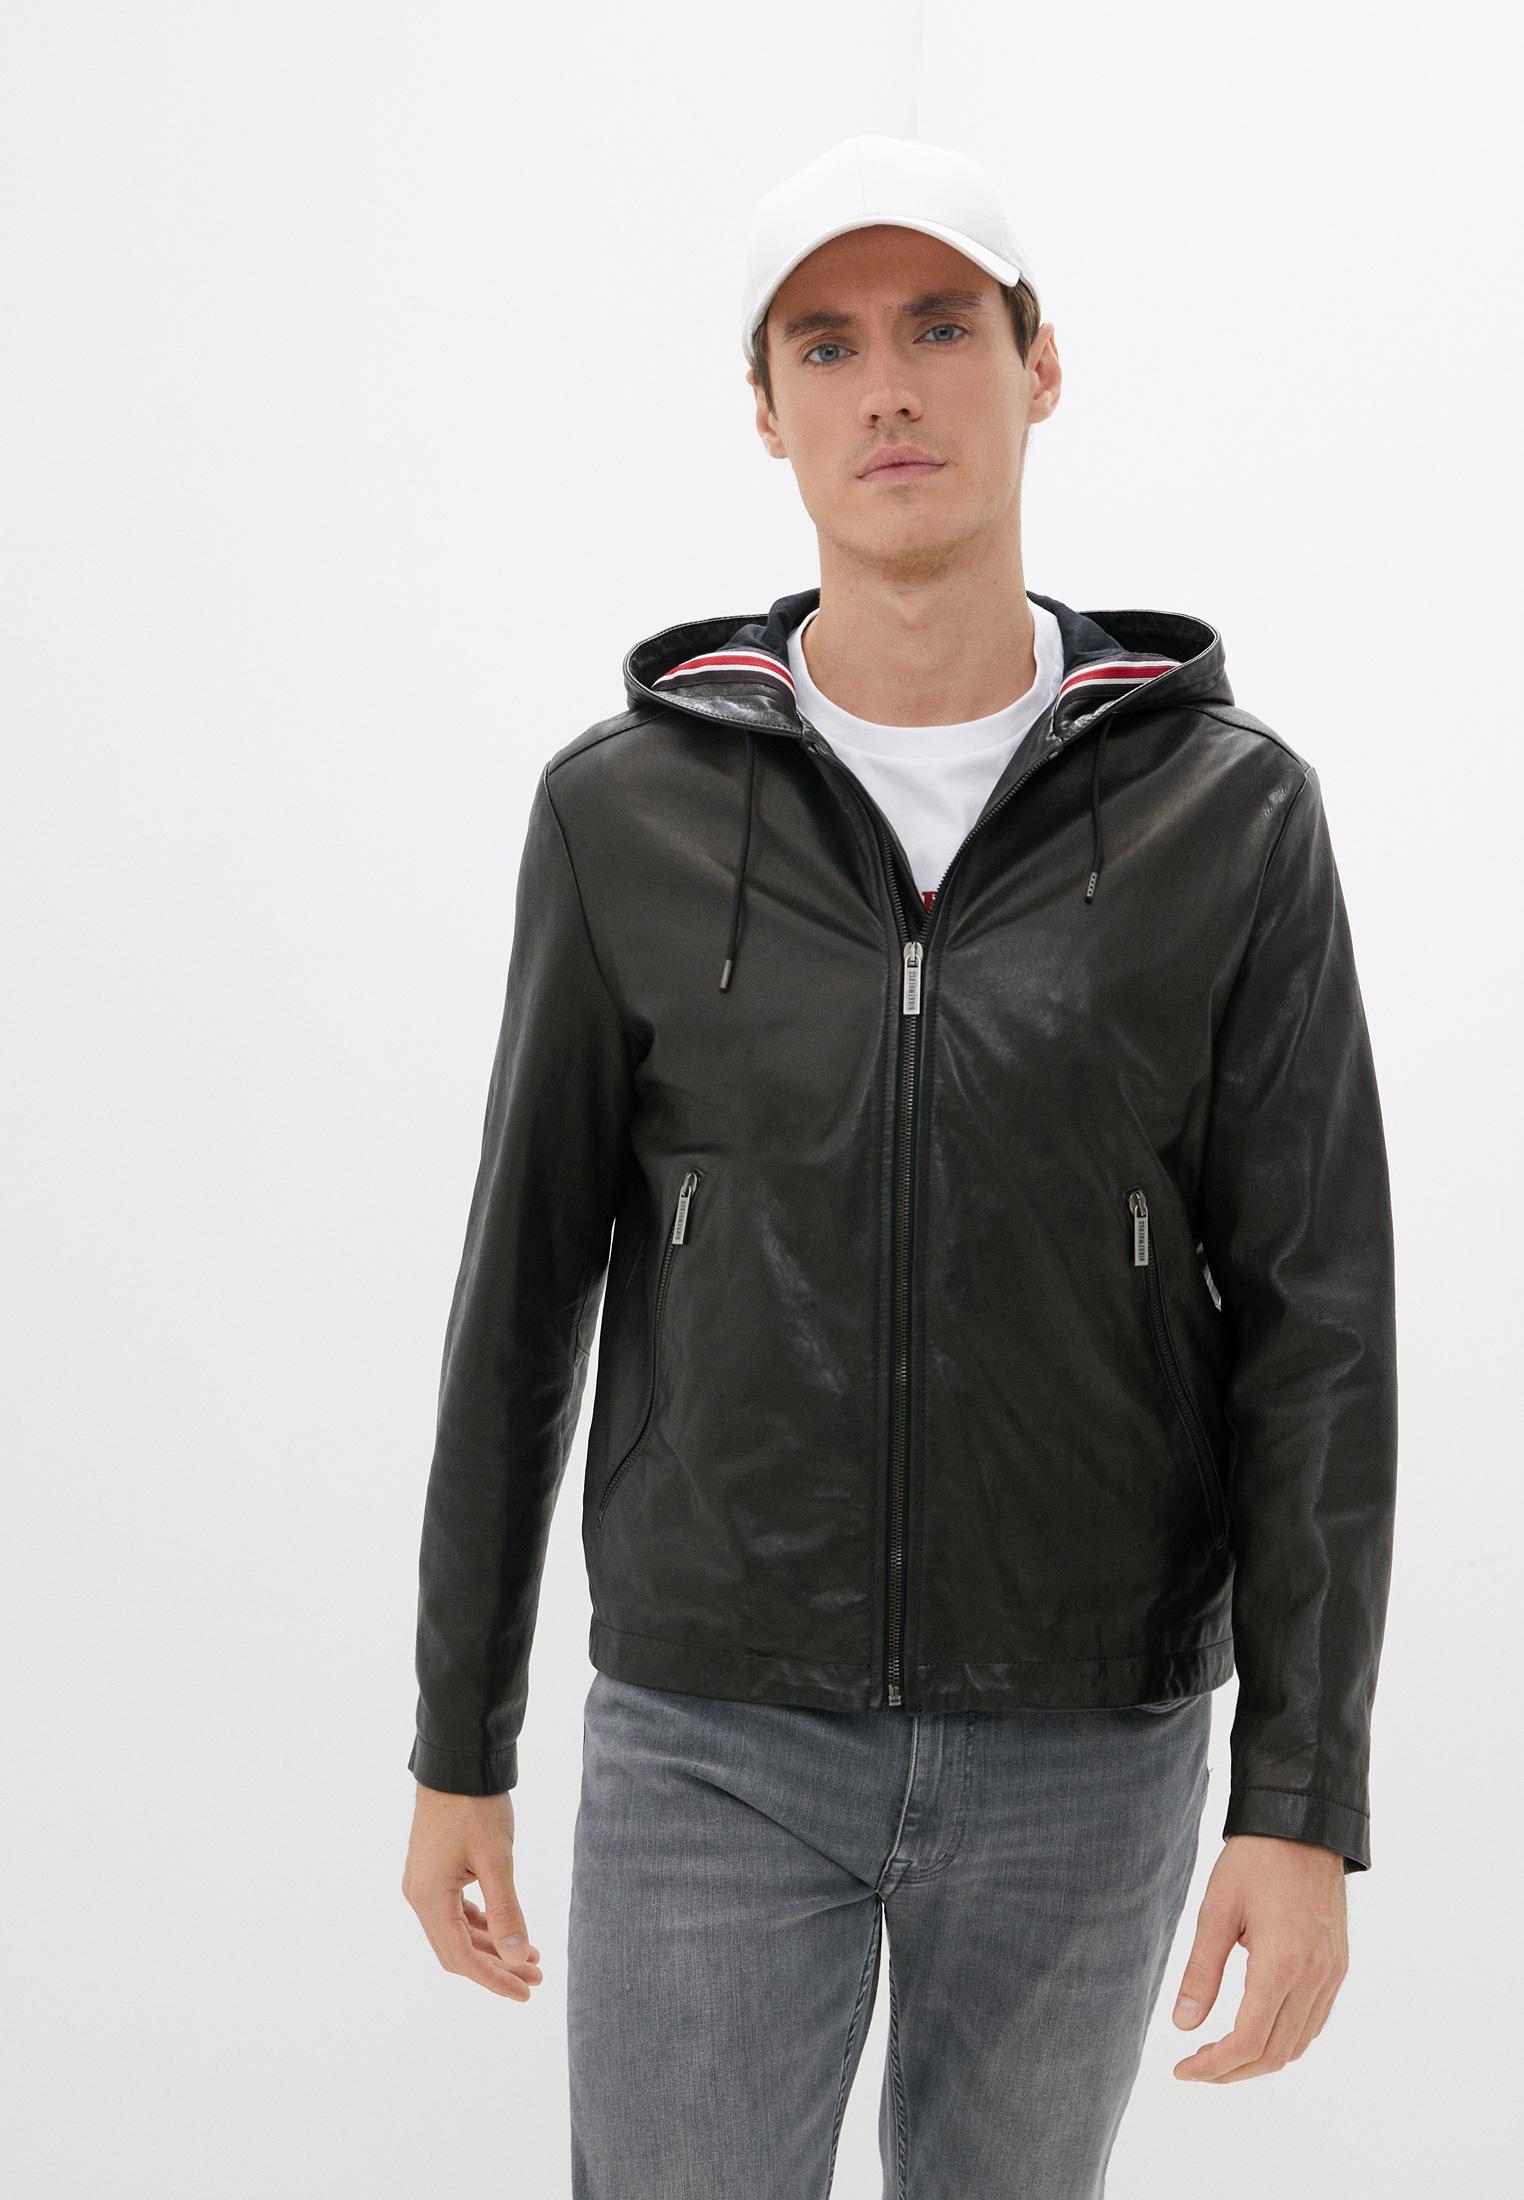 Кожаная куртка Bikkembergs (Биккембергс) C H 201 00 D 1197: изображение 1